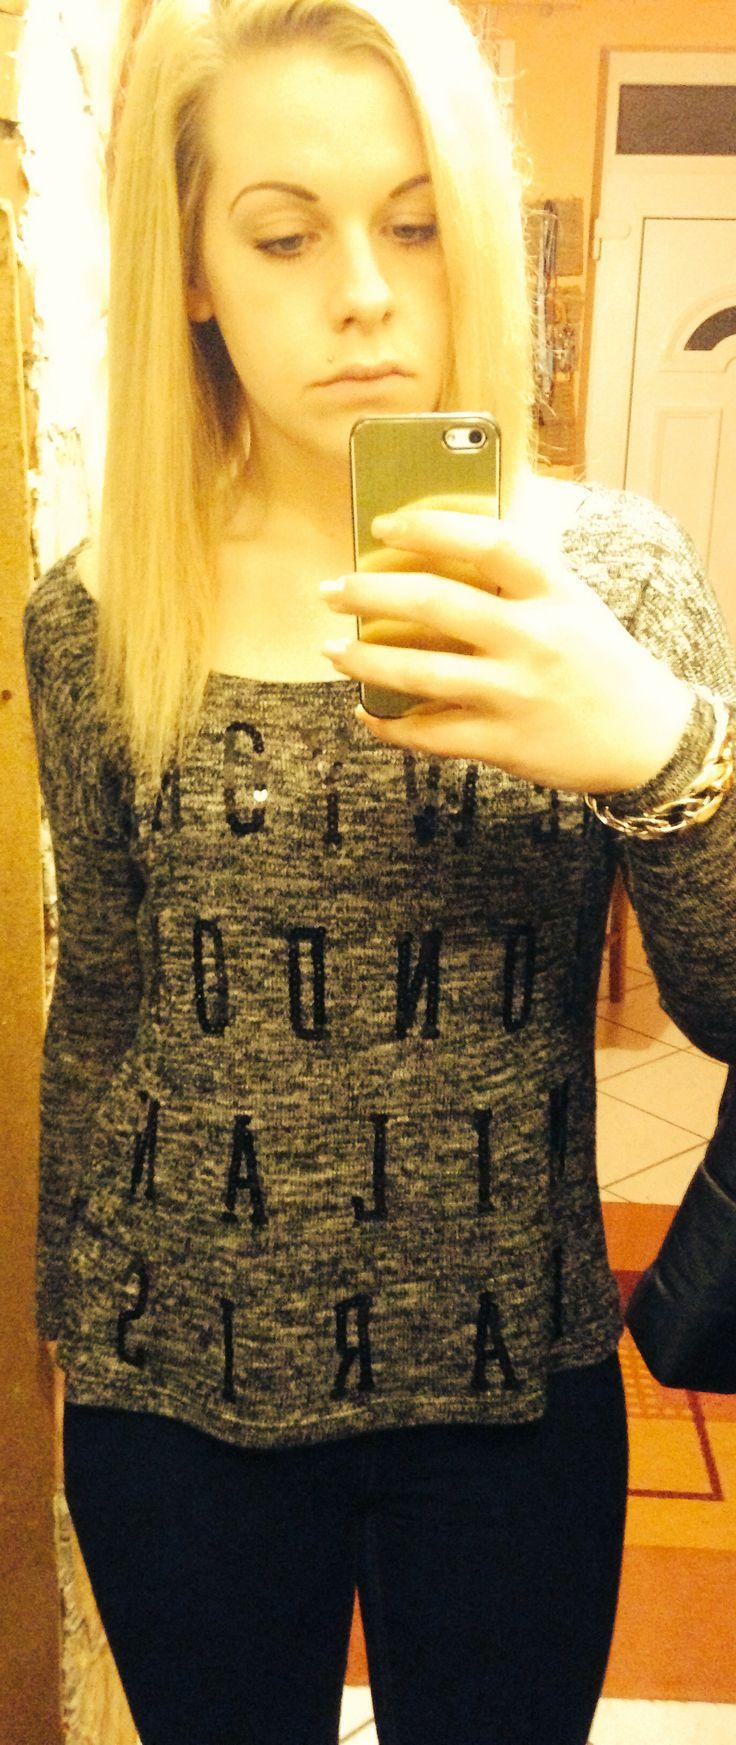 #selfie #outfit #tallyweijl #fashion